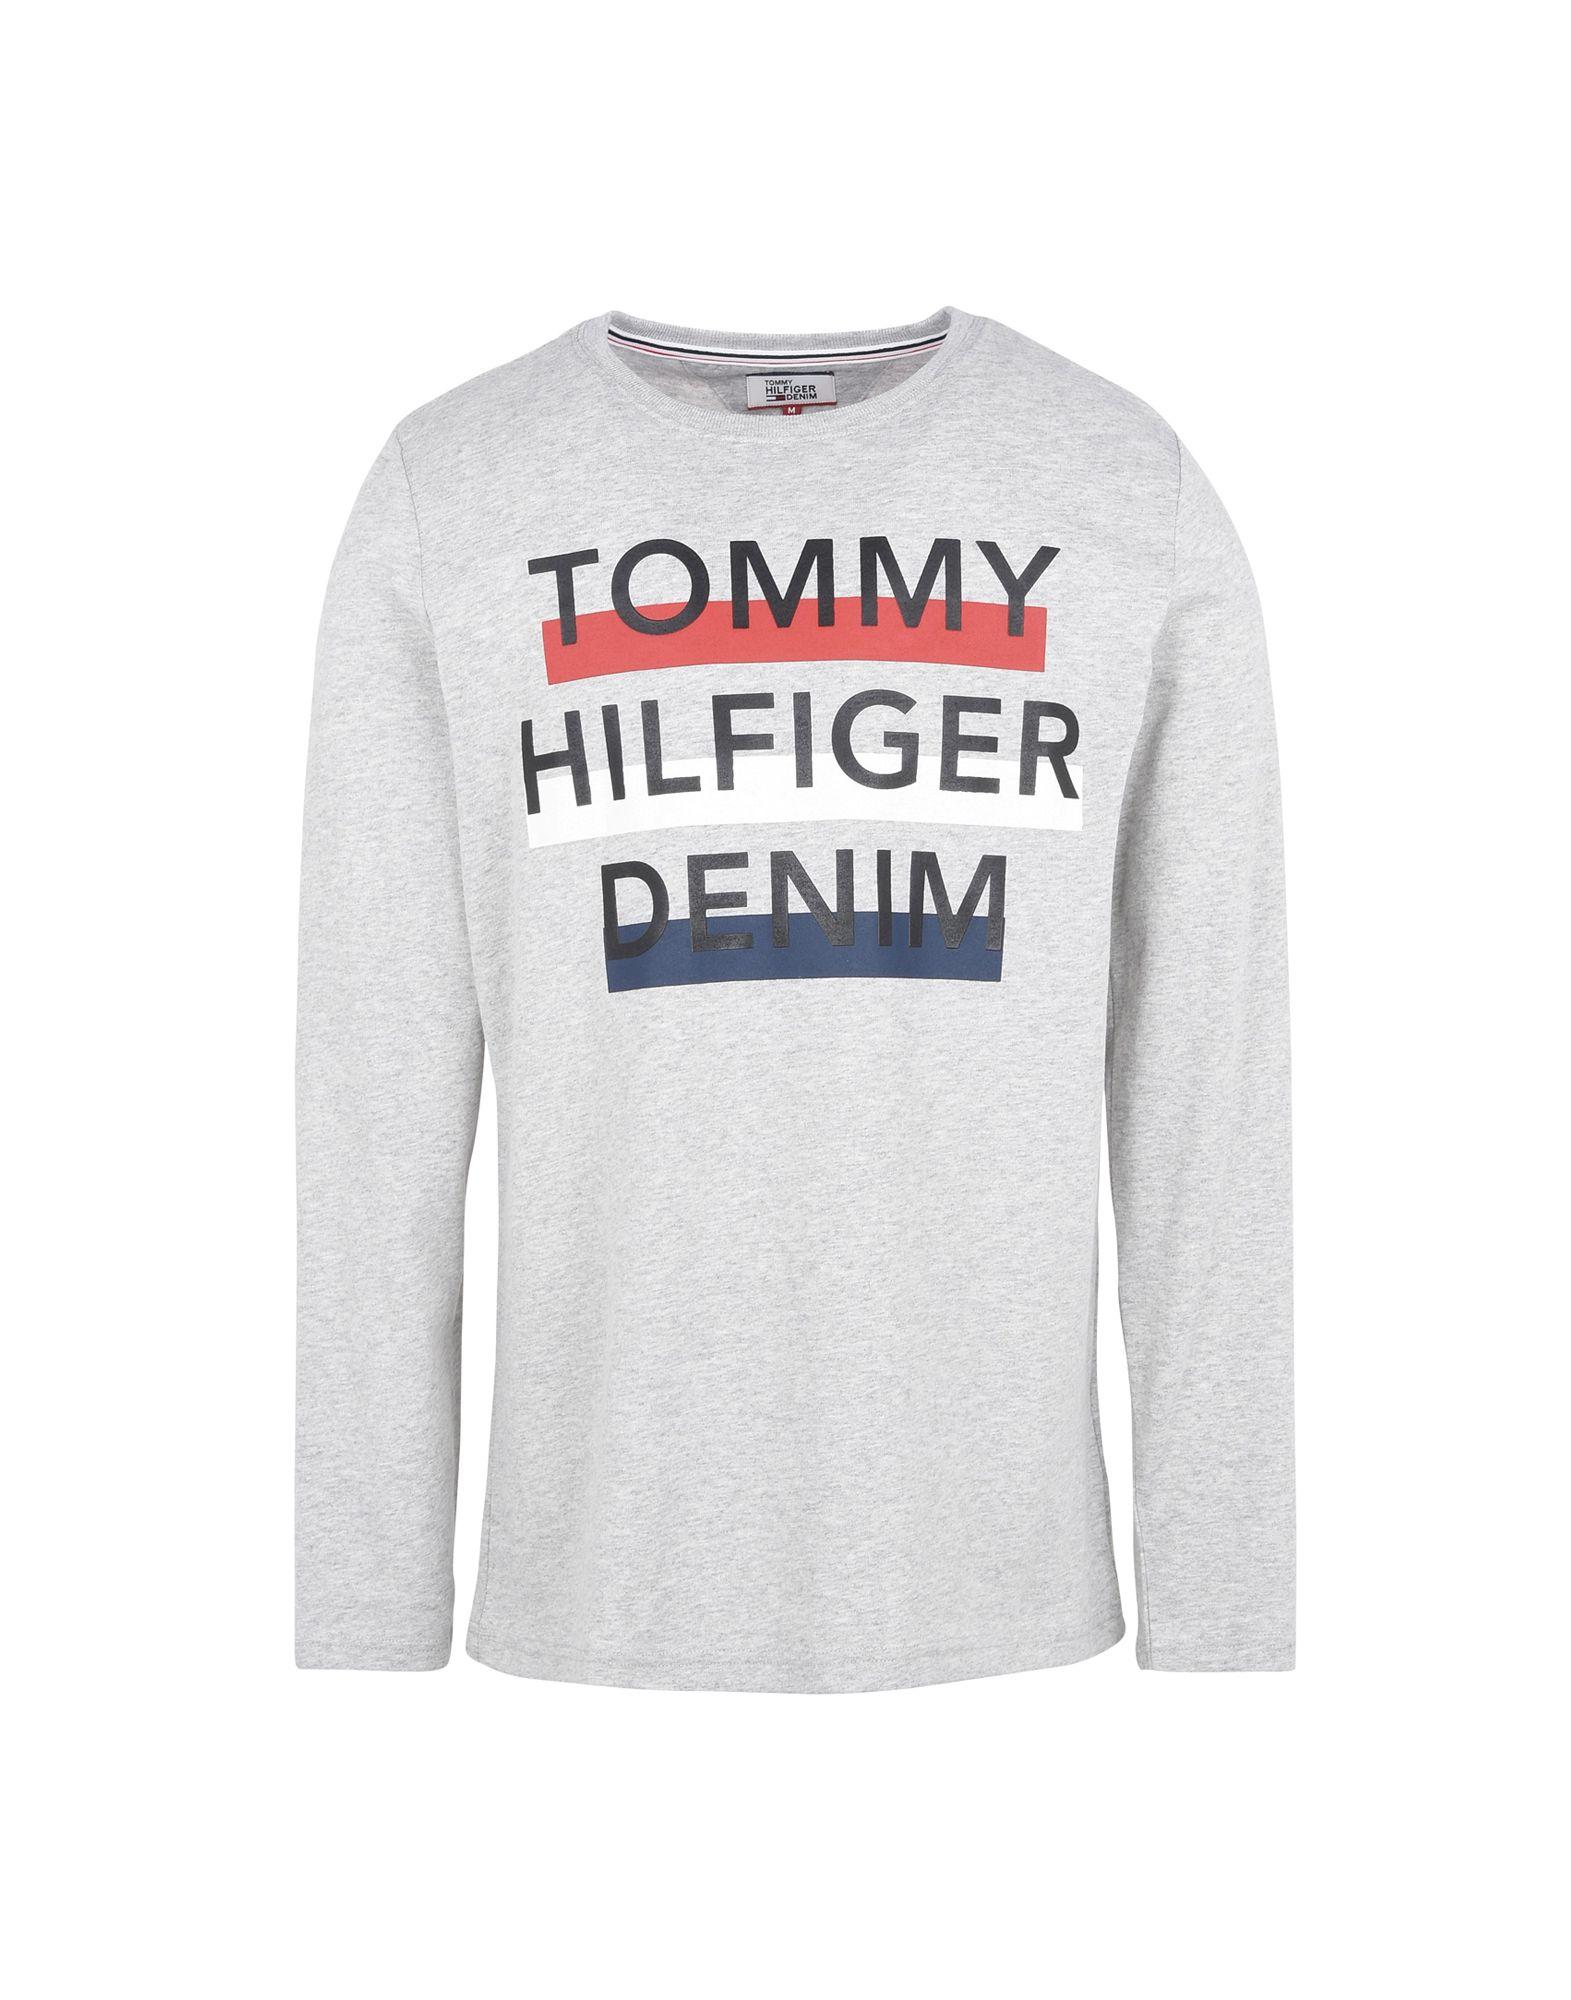 TOMMY HILFIGER DENIM Футболка футболка tommy hilfiger denim tommy hilfiger denim to013emtpa23